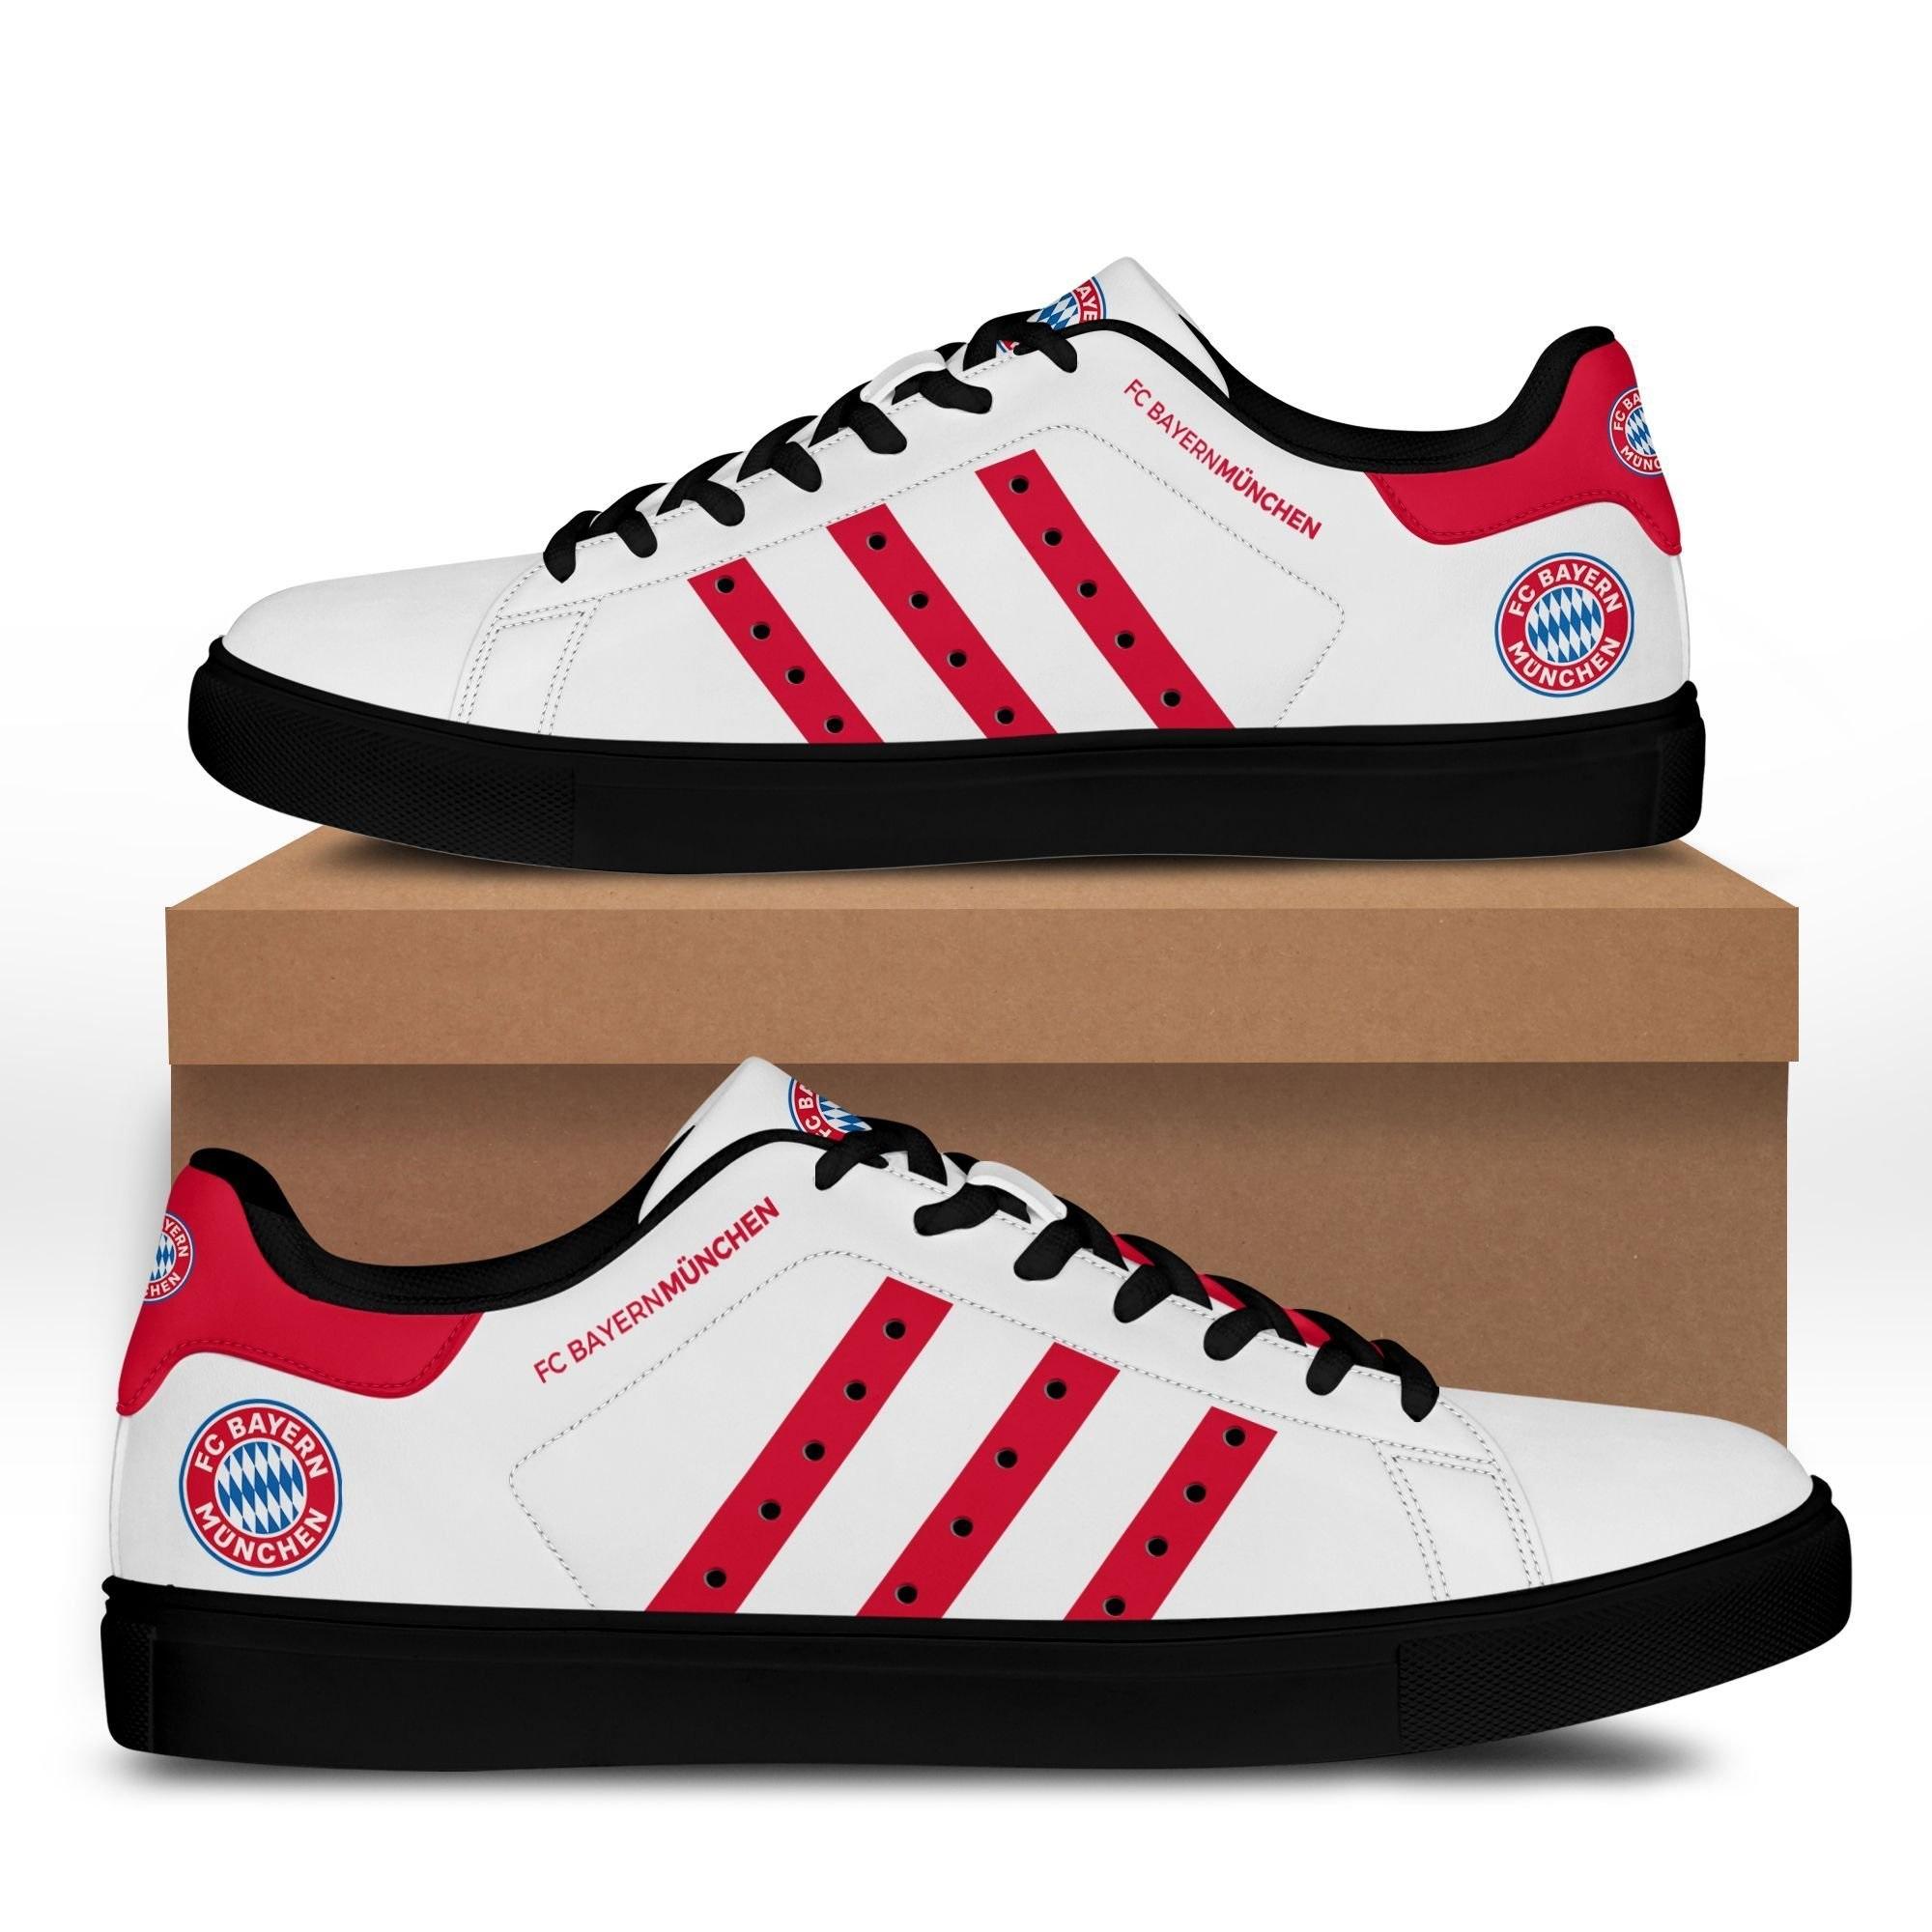 Bayern Munchen stan smith shoes